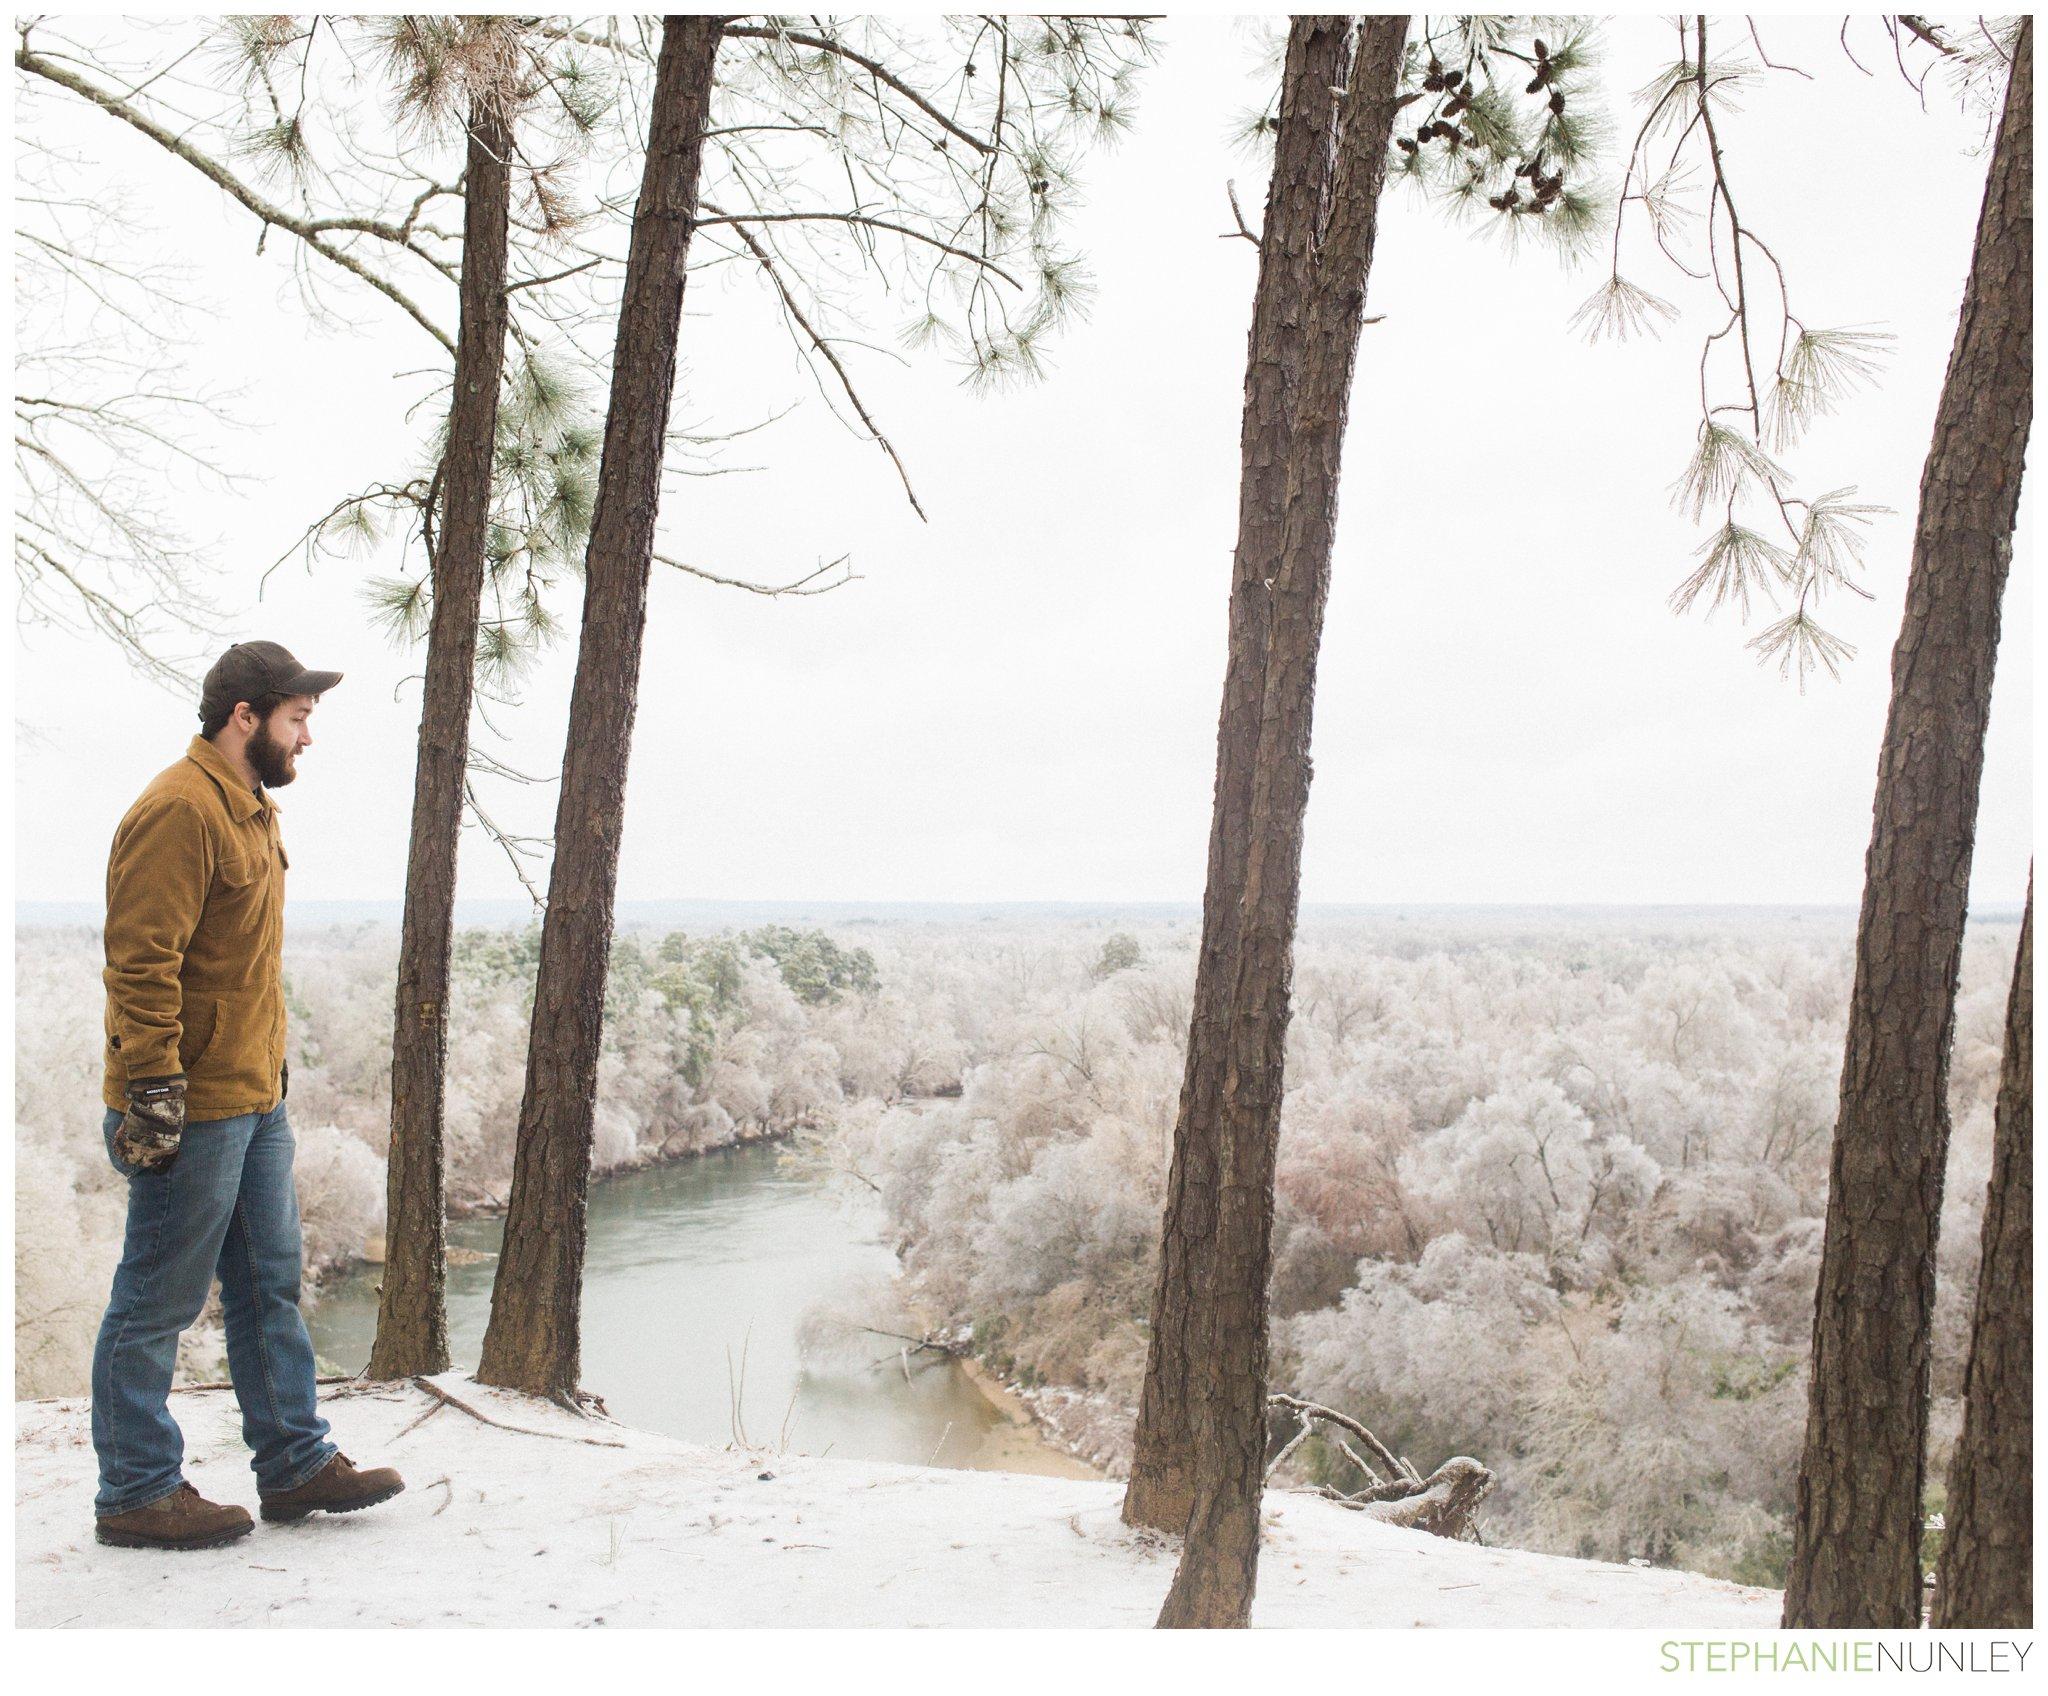 arkansas-winter-scenery-008.jpg